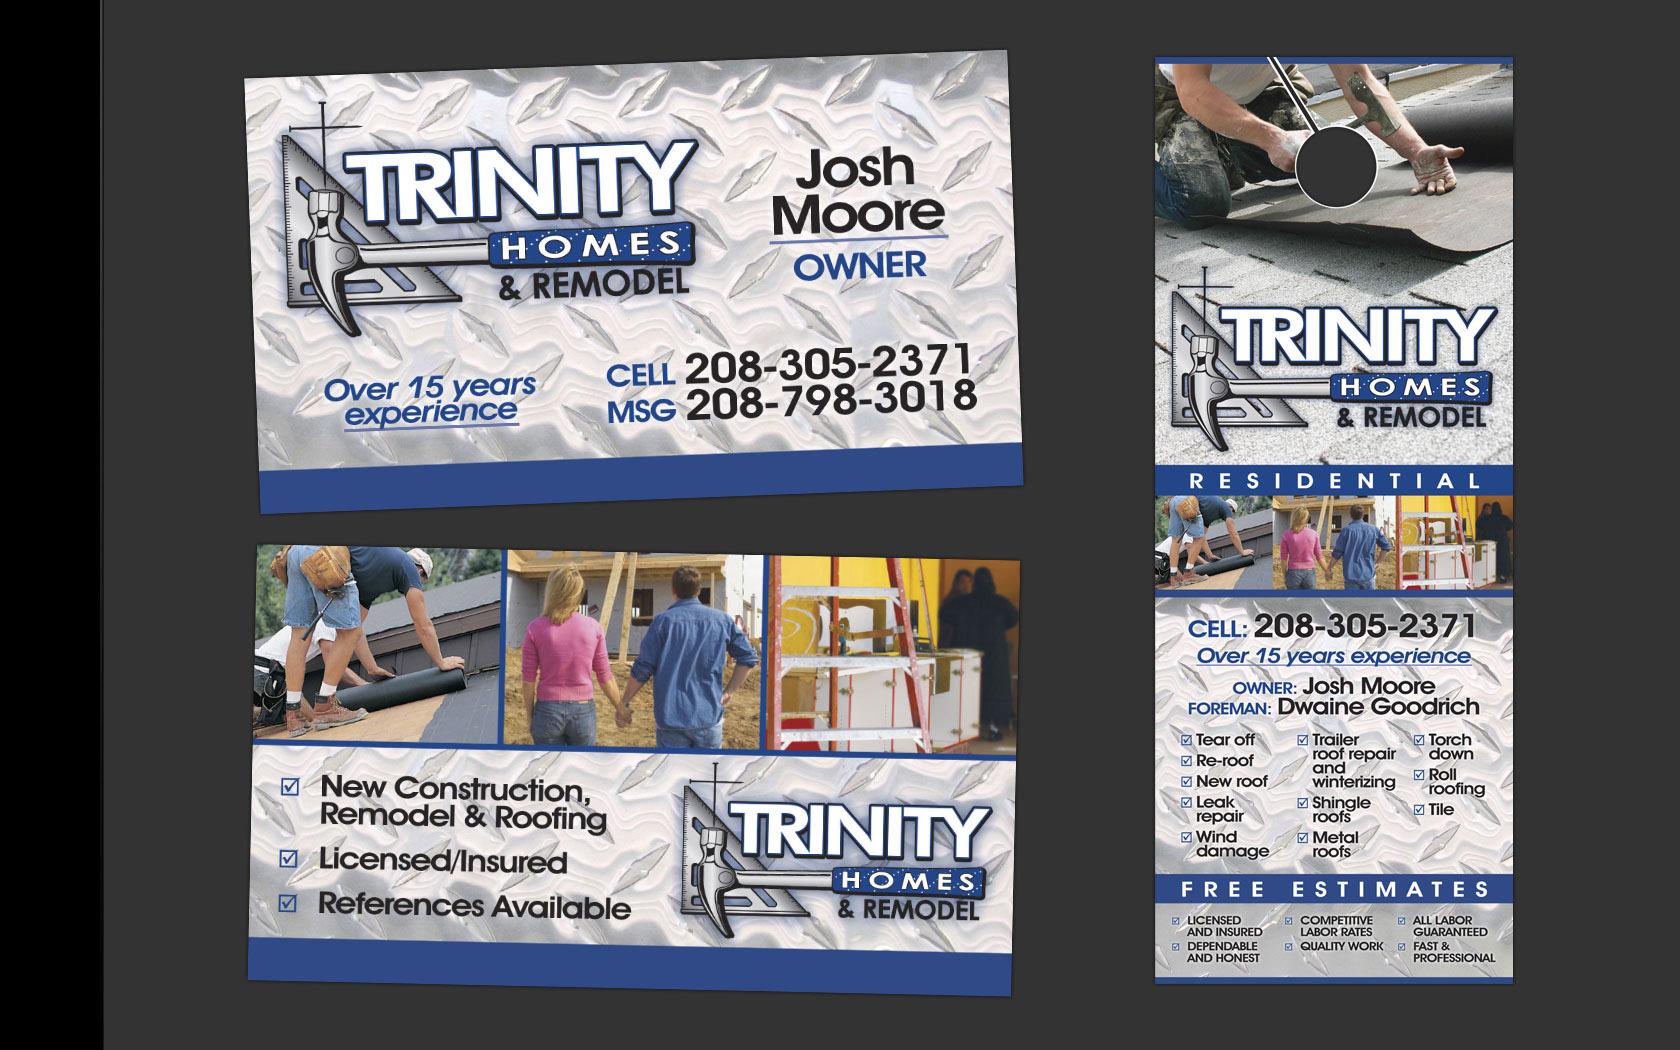 TrinityHomes_1680x1050.jpg